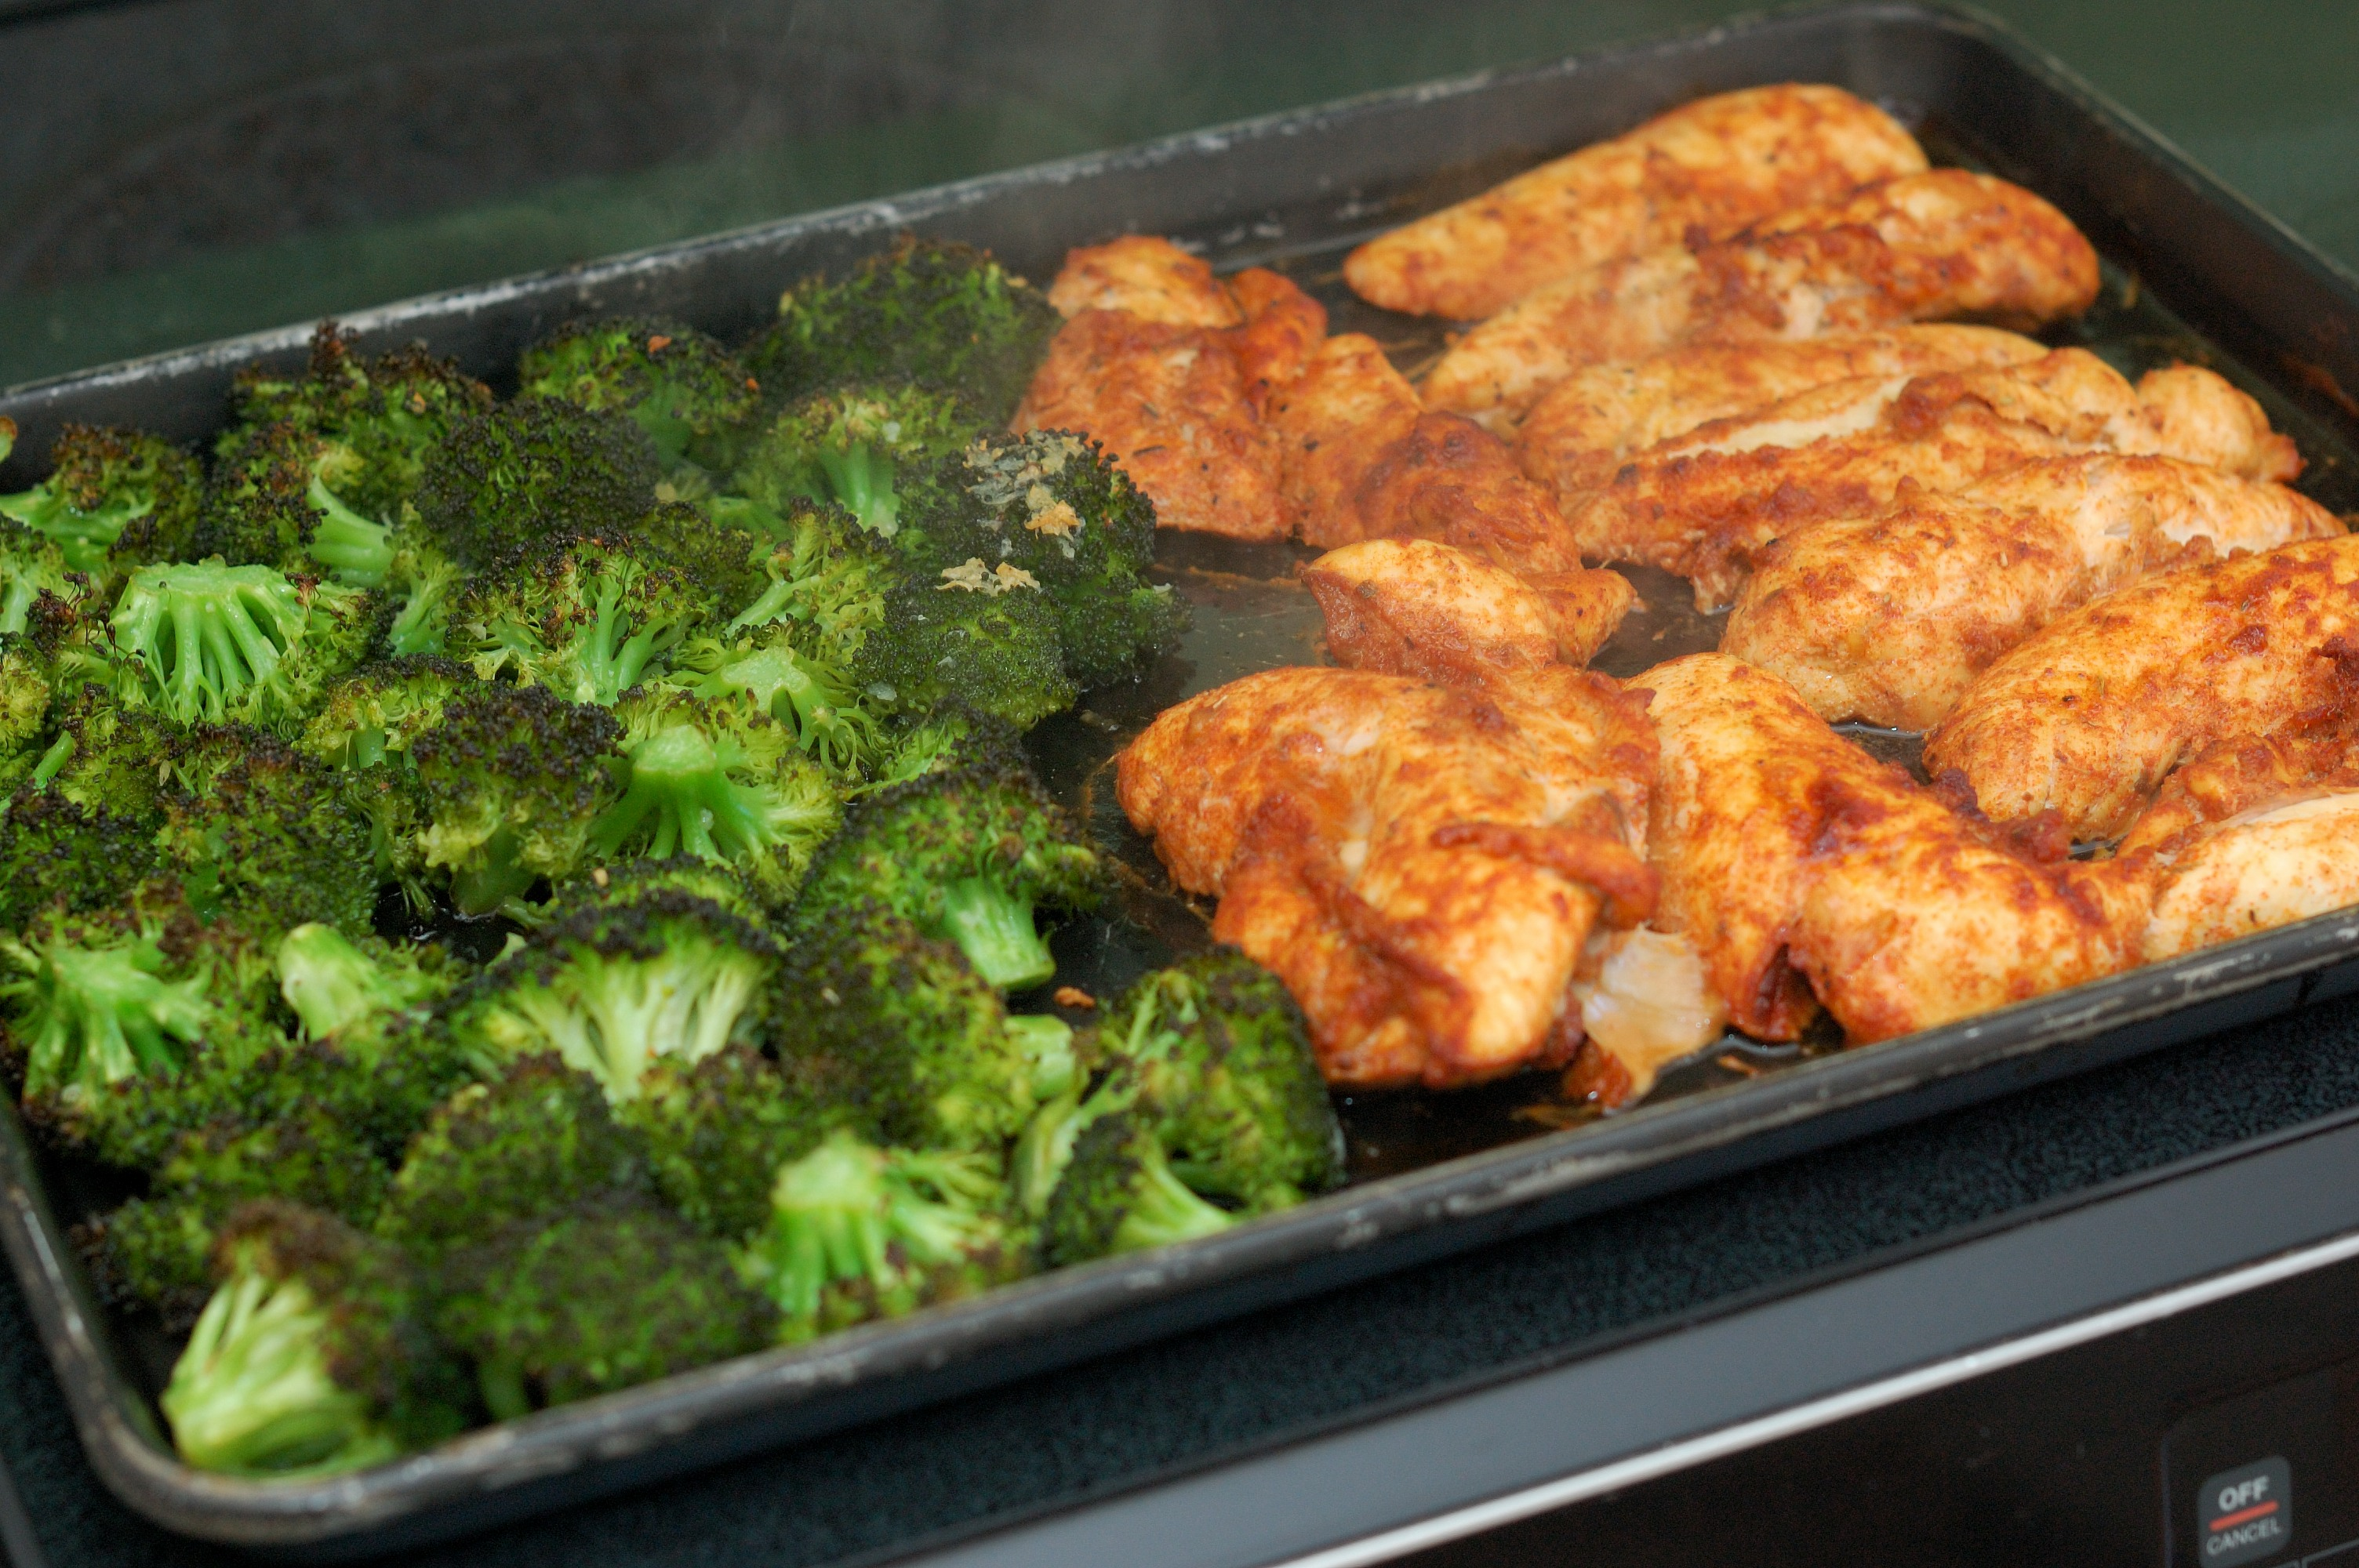 Creamy Pasta Salad Recipe Chicken And Broccoli Baked